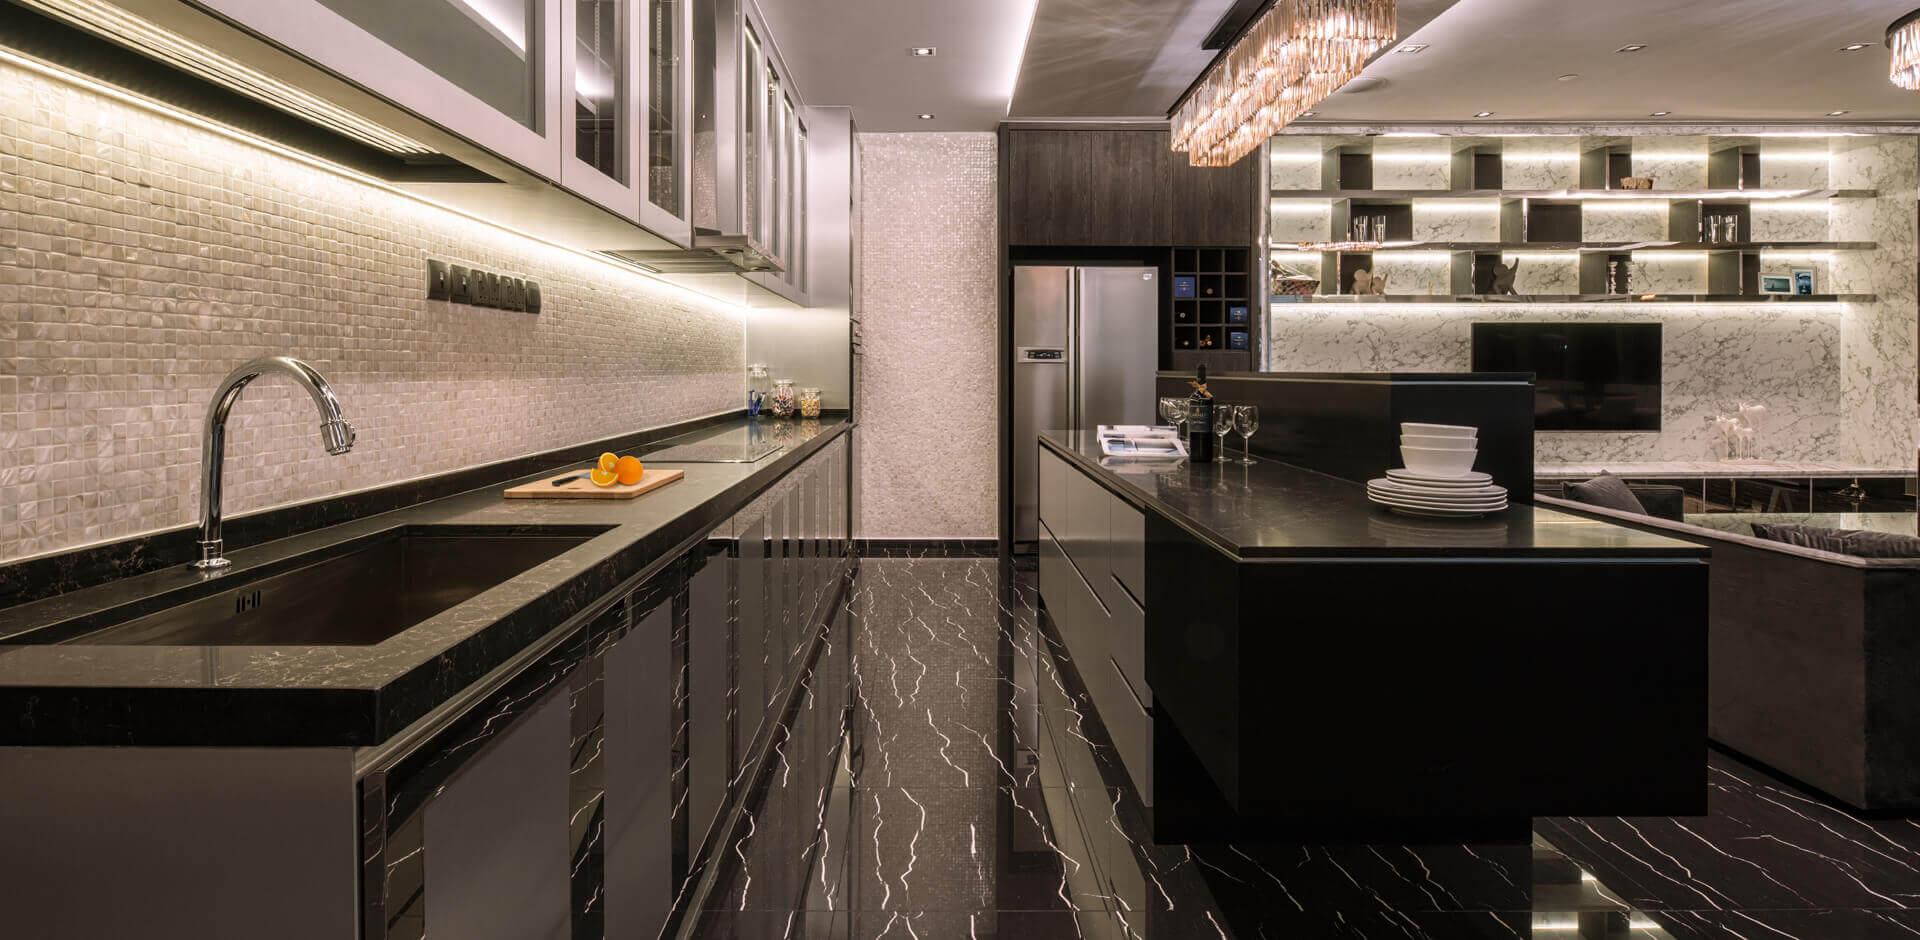 Interior design company singapore best interior designer for Top interior design companies in singapore